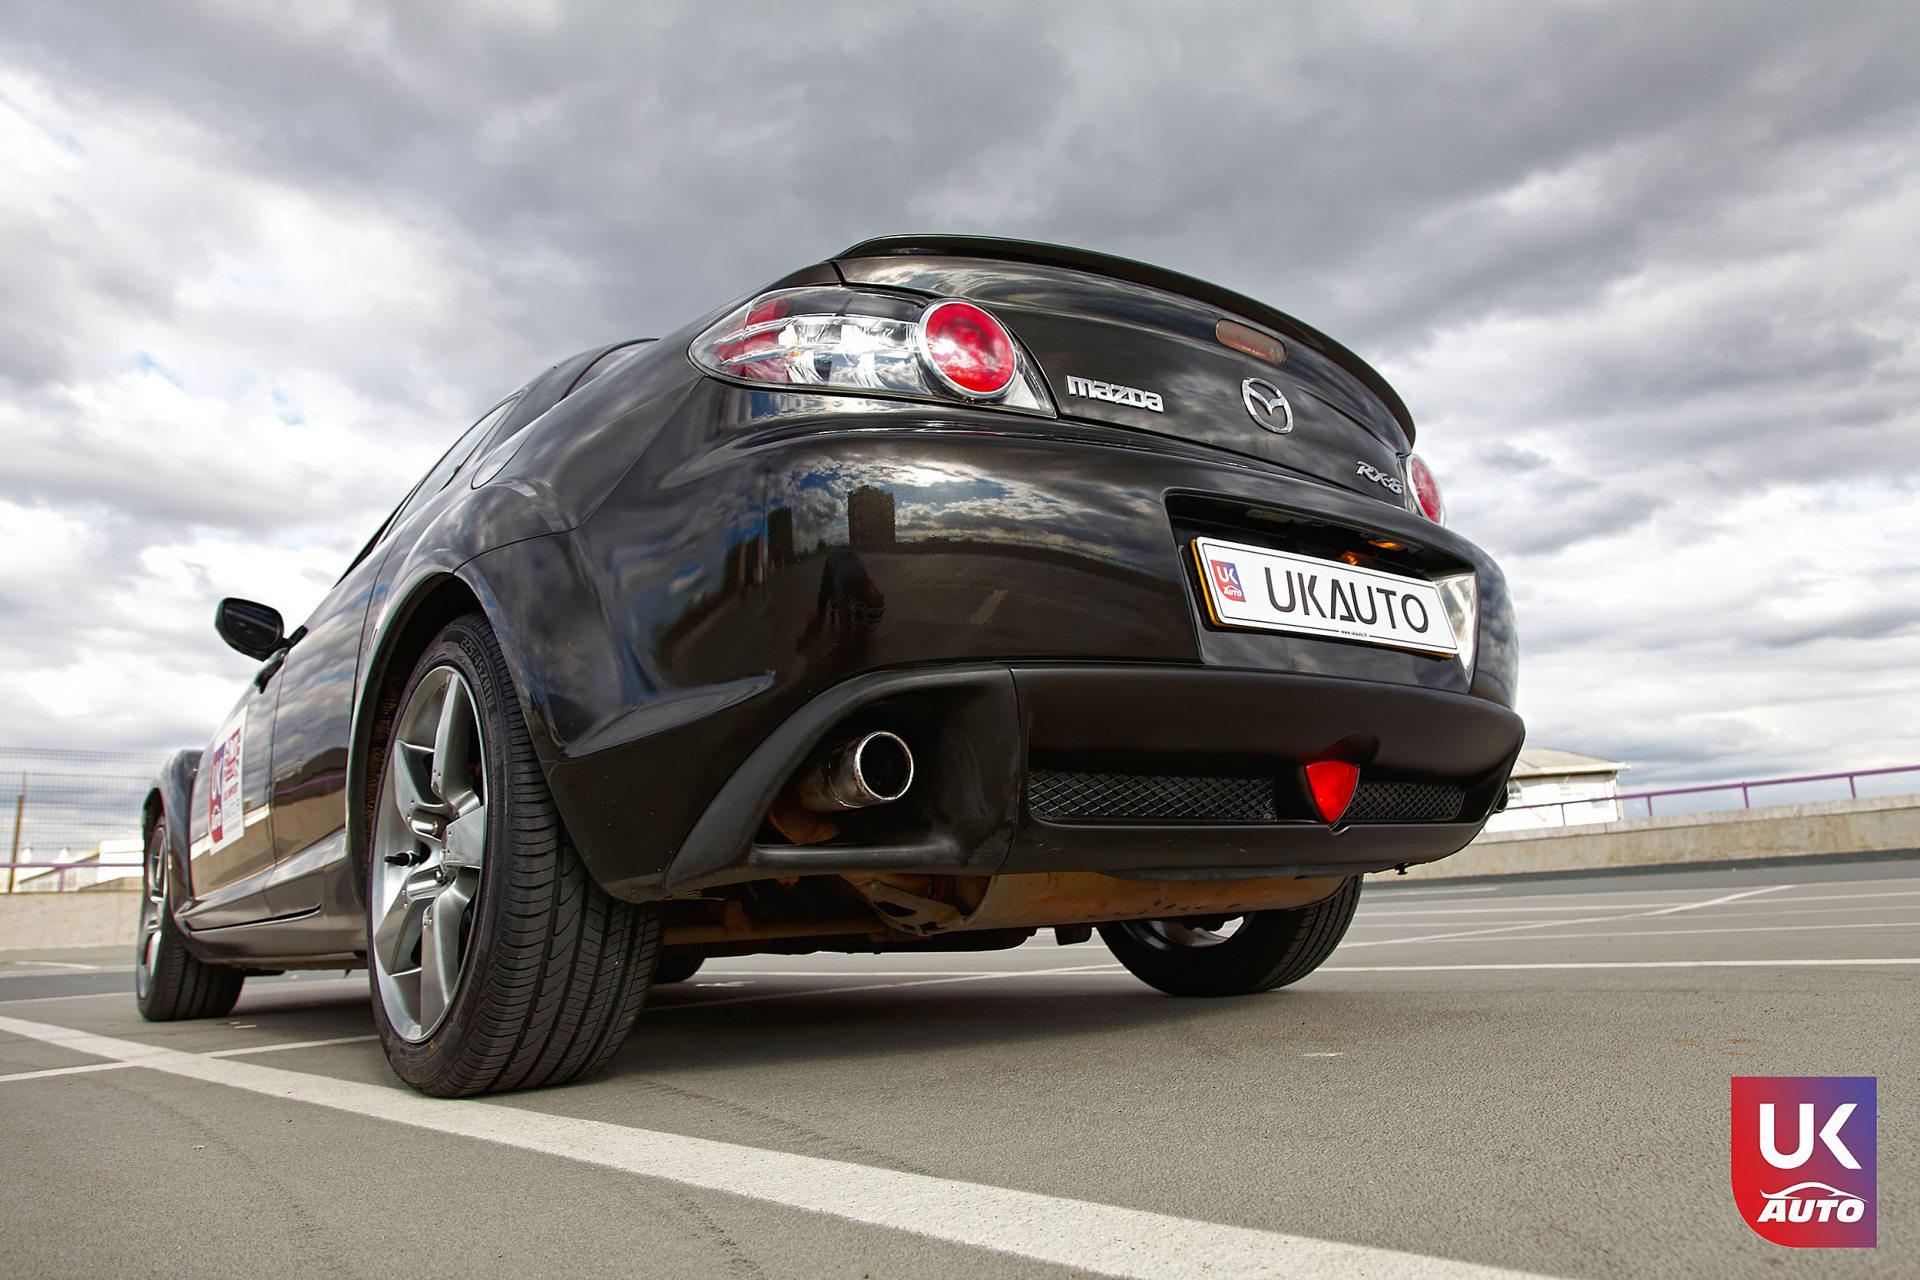 Mazda RX8 Rotary mazda angleterre mazda uk RX8 KURO import uk rhd11 DxO - Import Mazda RX8 KURO ROTARY depuis Autotrader par UKAUTO site annonces UK rhd Felicitation a Dimitri